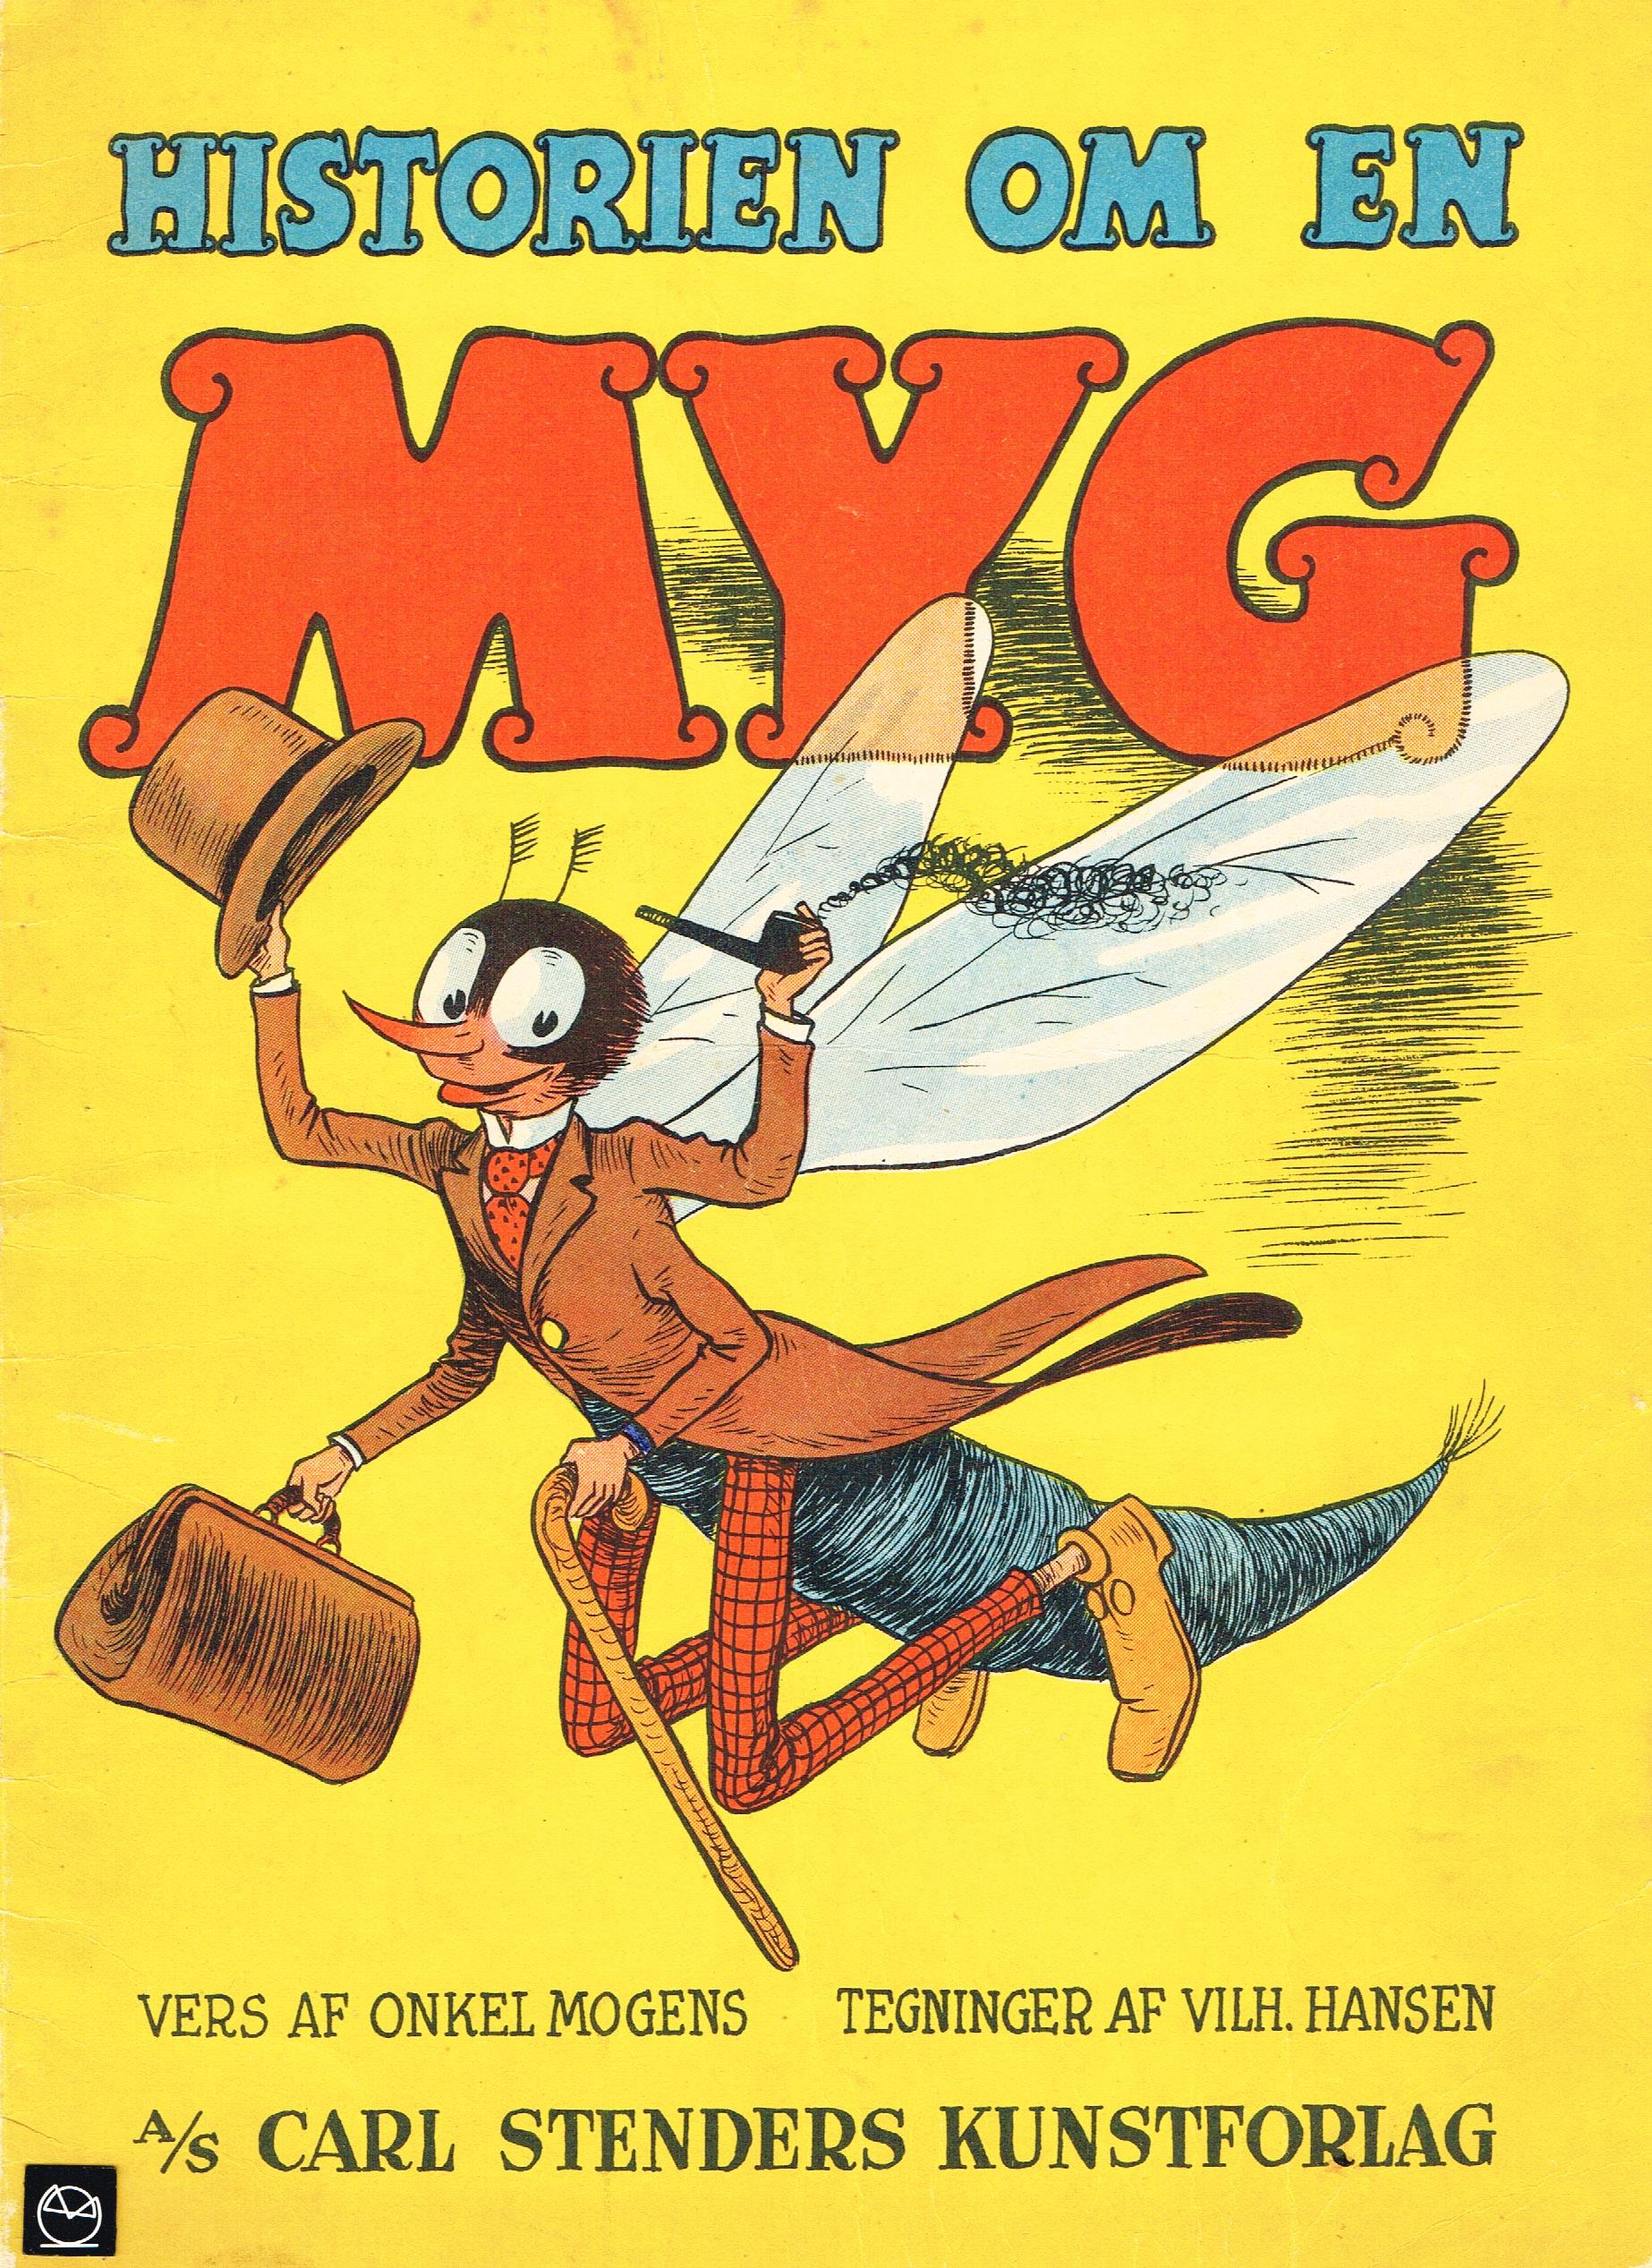 Historien om en myg billedbog